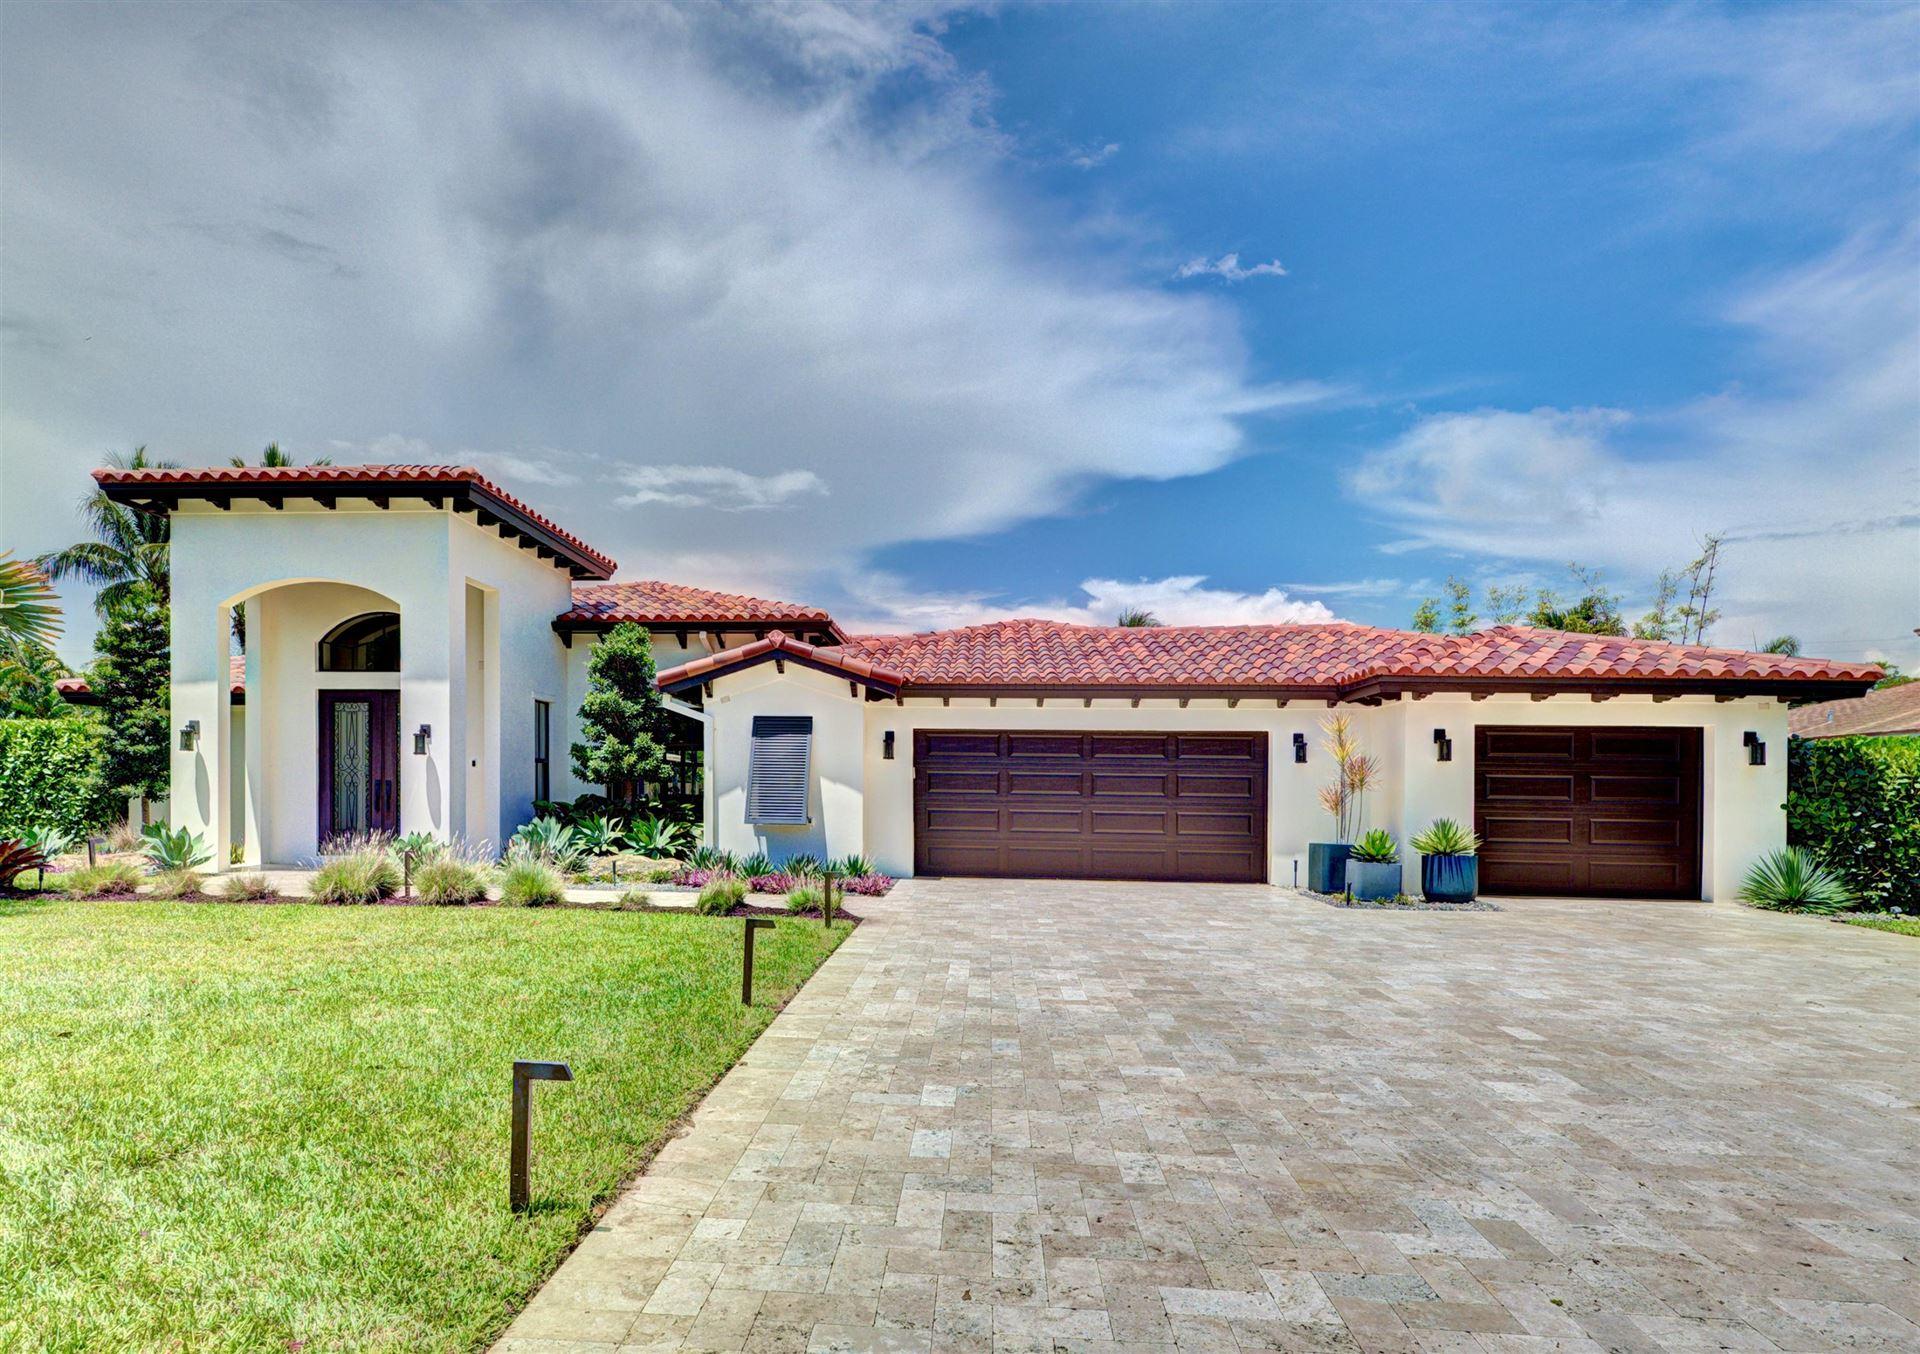 2020 NW 2nd Avenue, Delray Beach, FL 33444 - #: RX-10645449